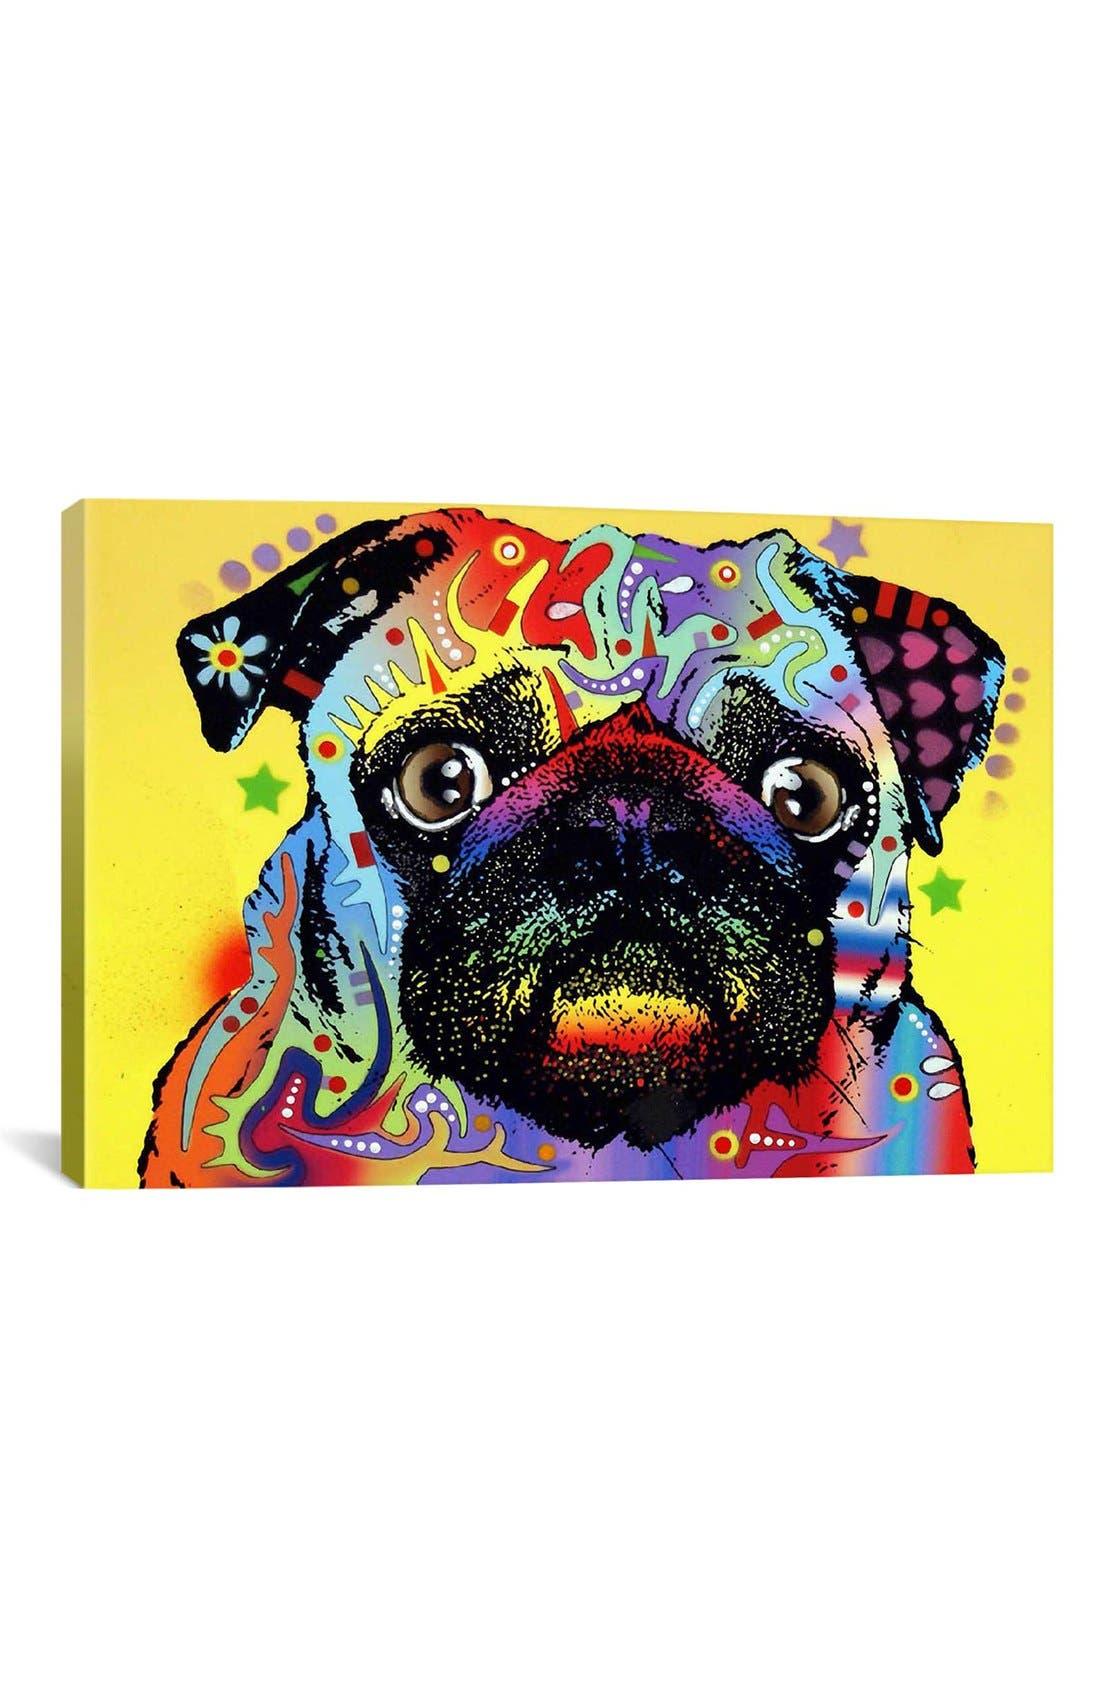 'Pug - Dean Russo' Giclée Print Canvas Art,                             Main thumbnail 1, color,                             700